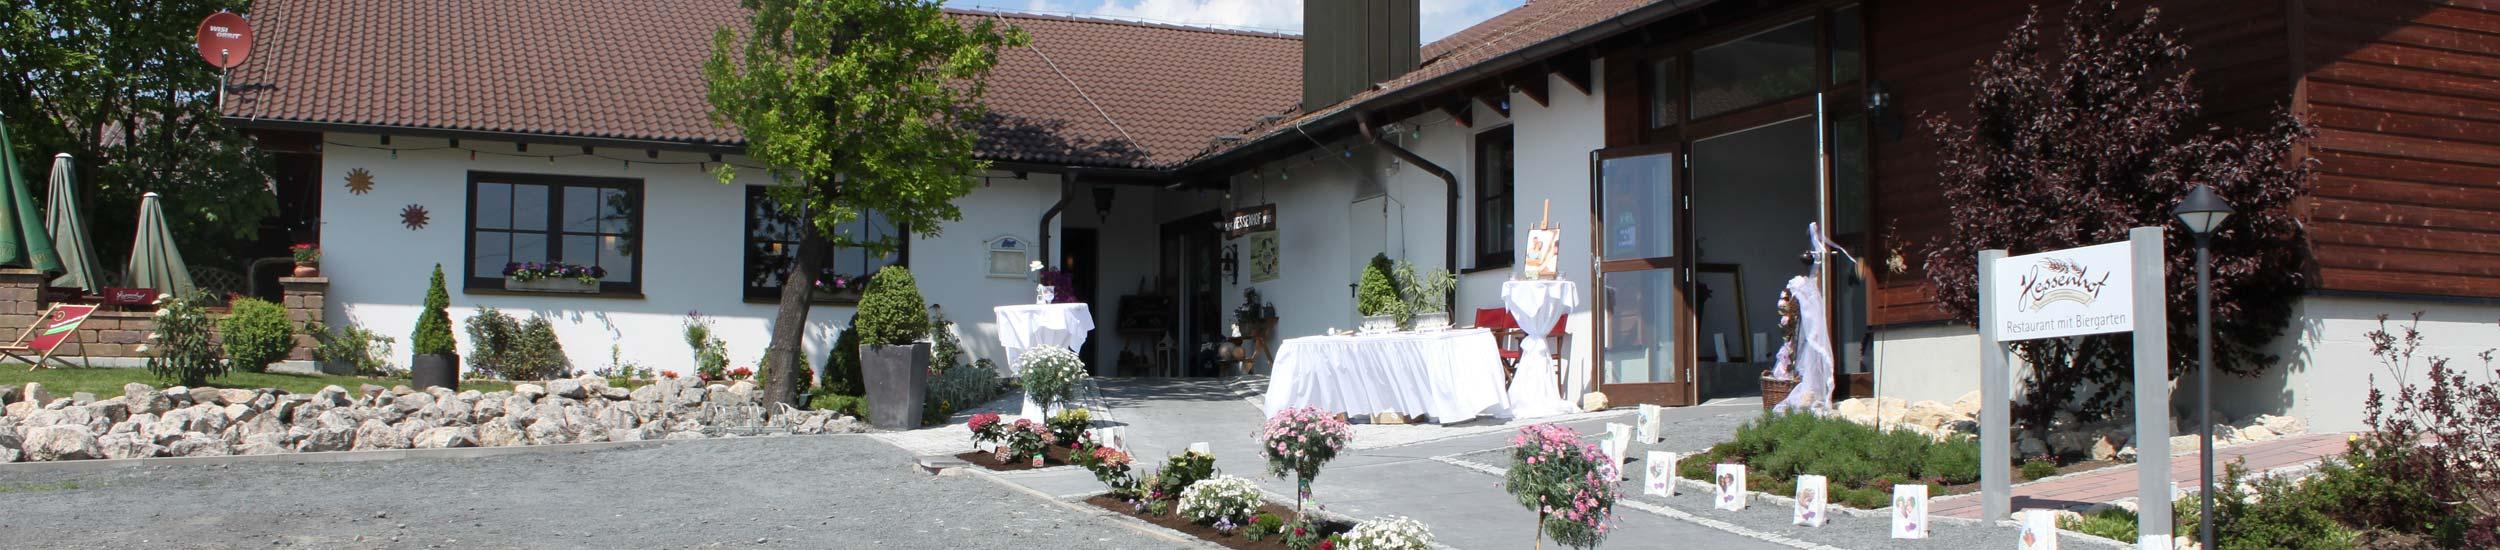 Hessenhof-Coburg-Restaurant